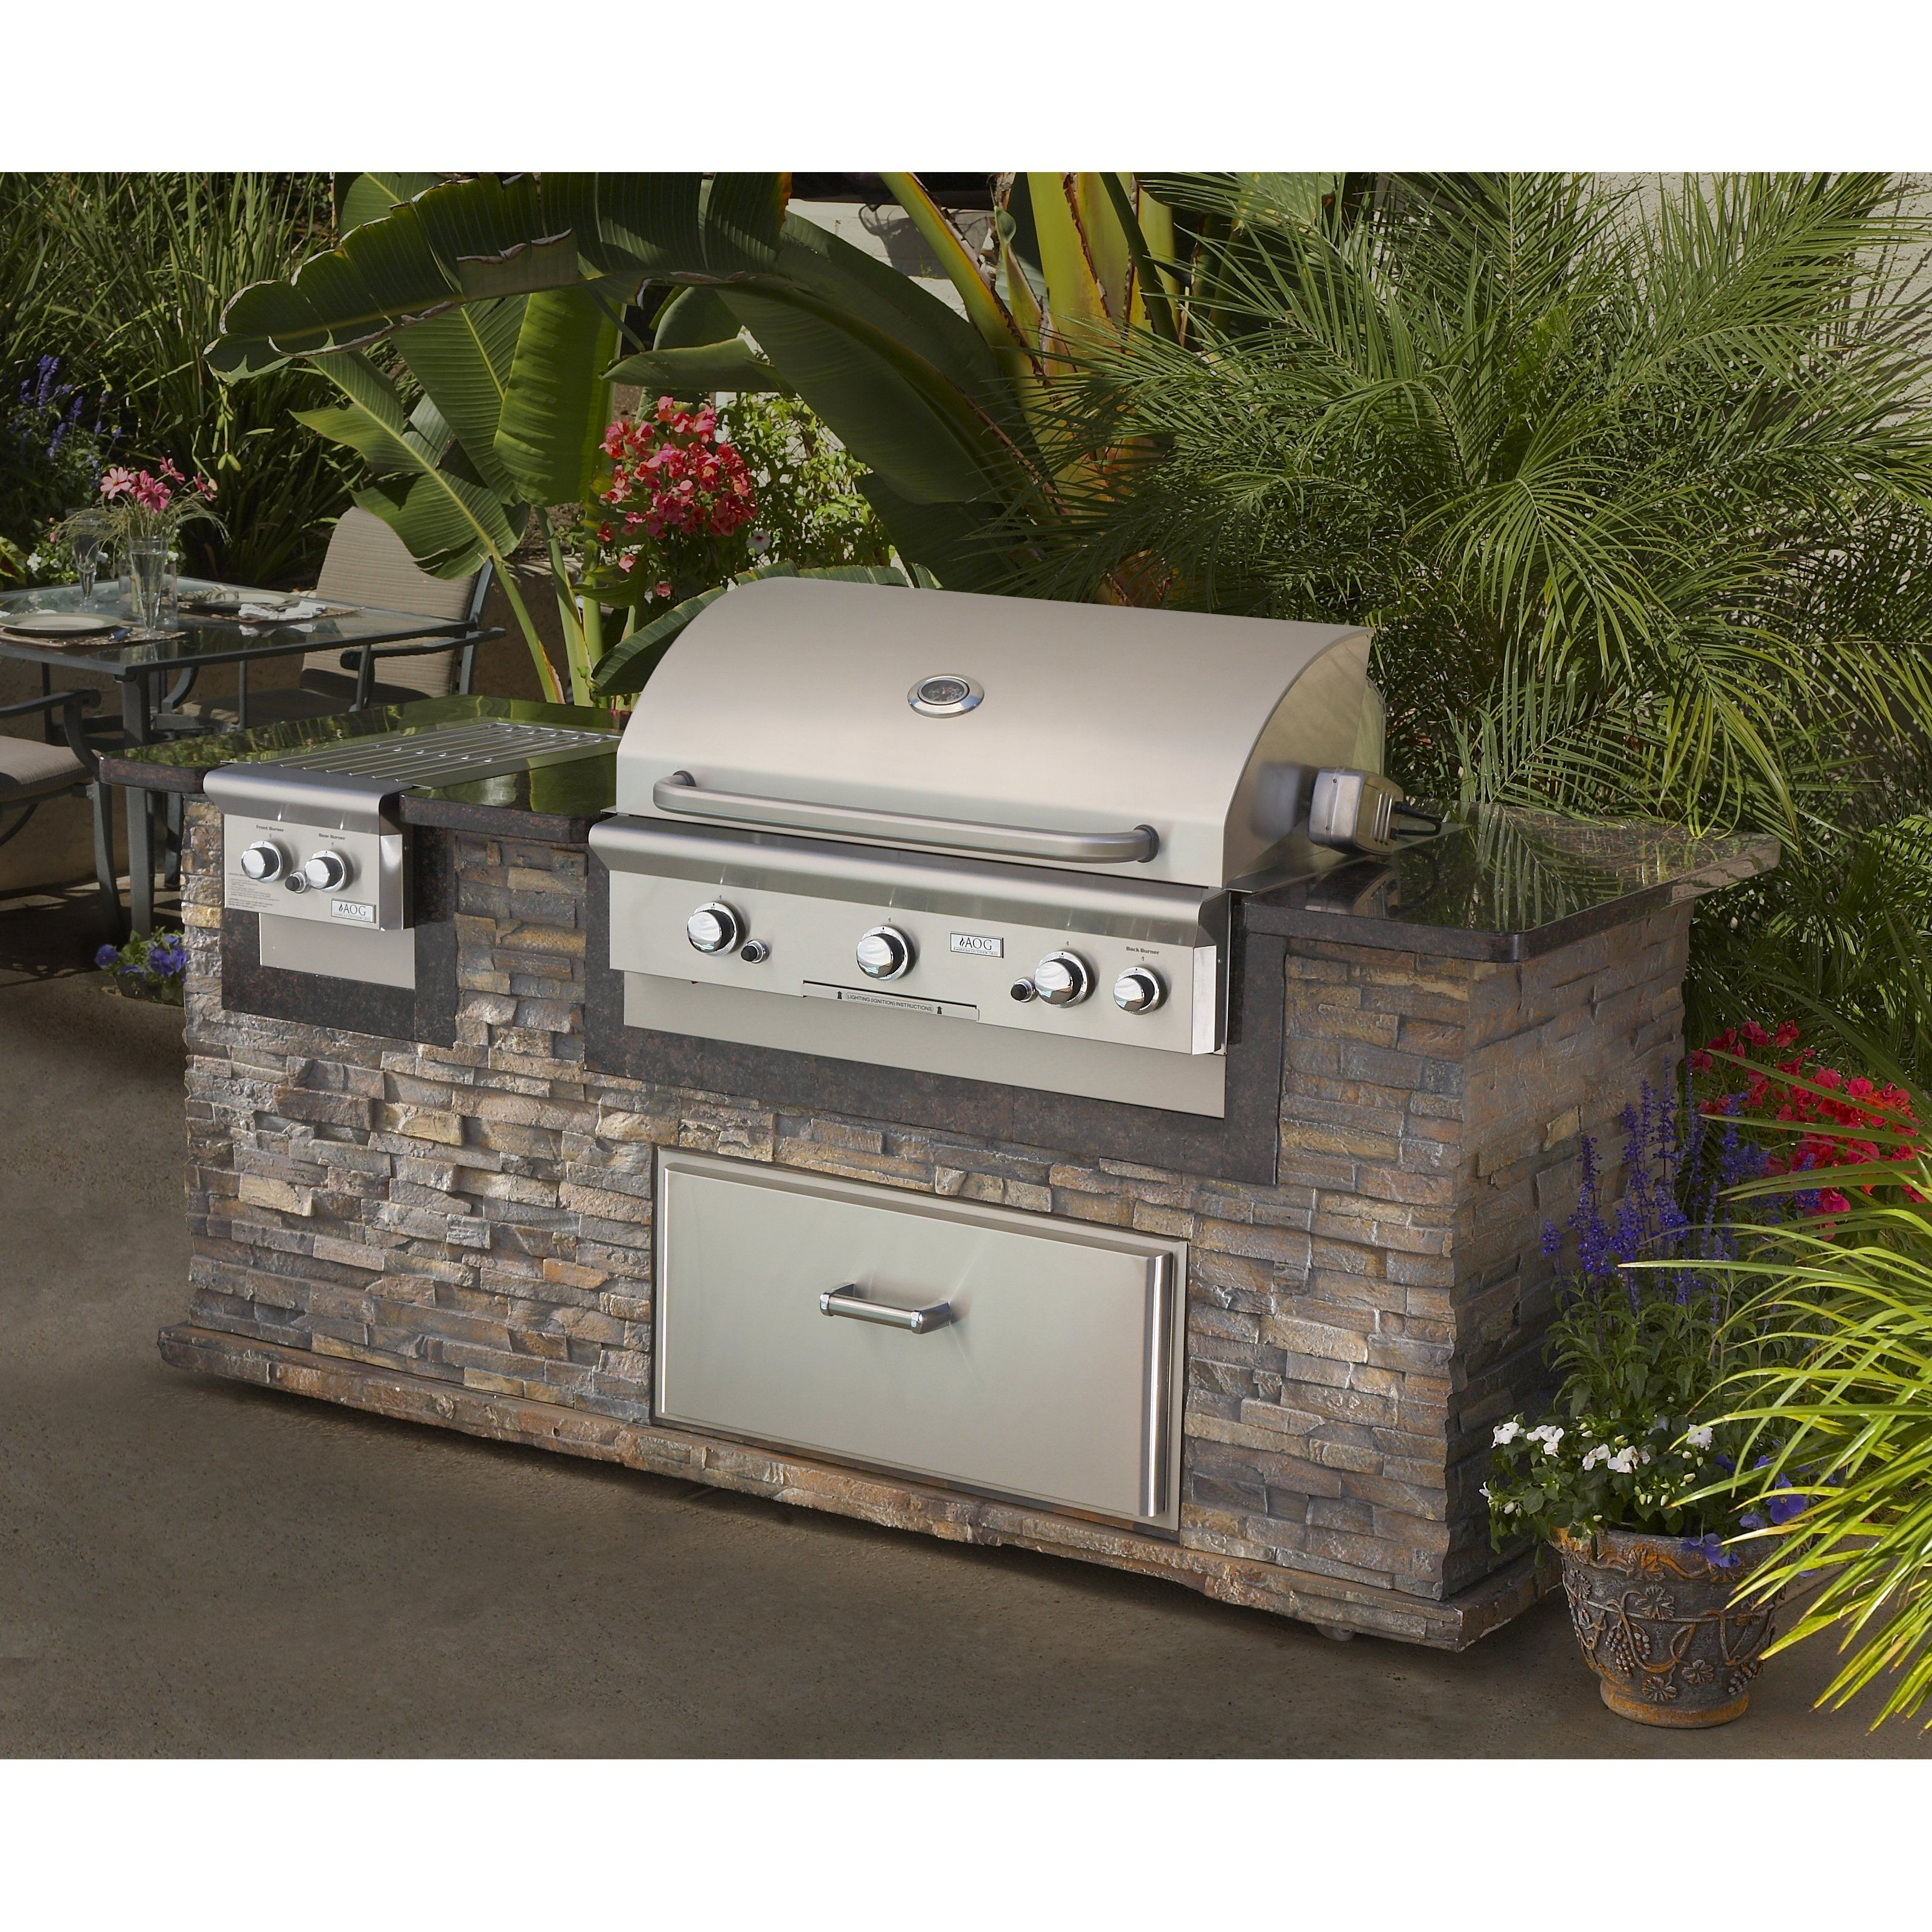 Backyard grill design idea. Outdoor kitchen island